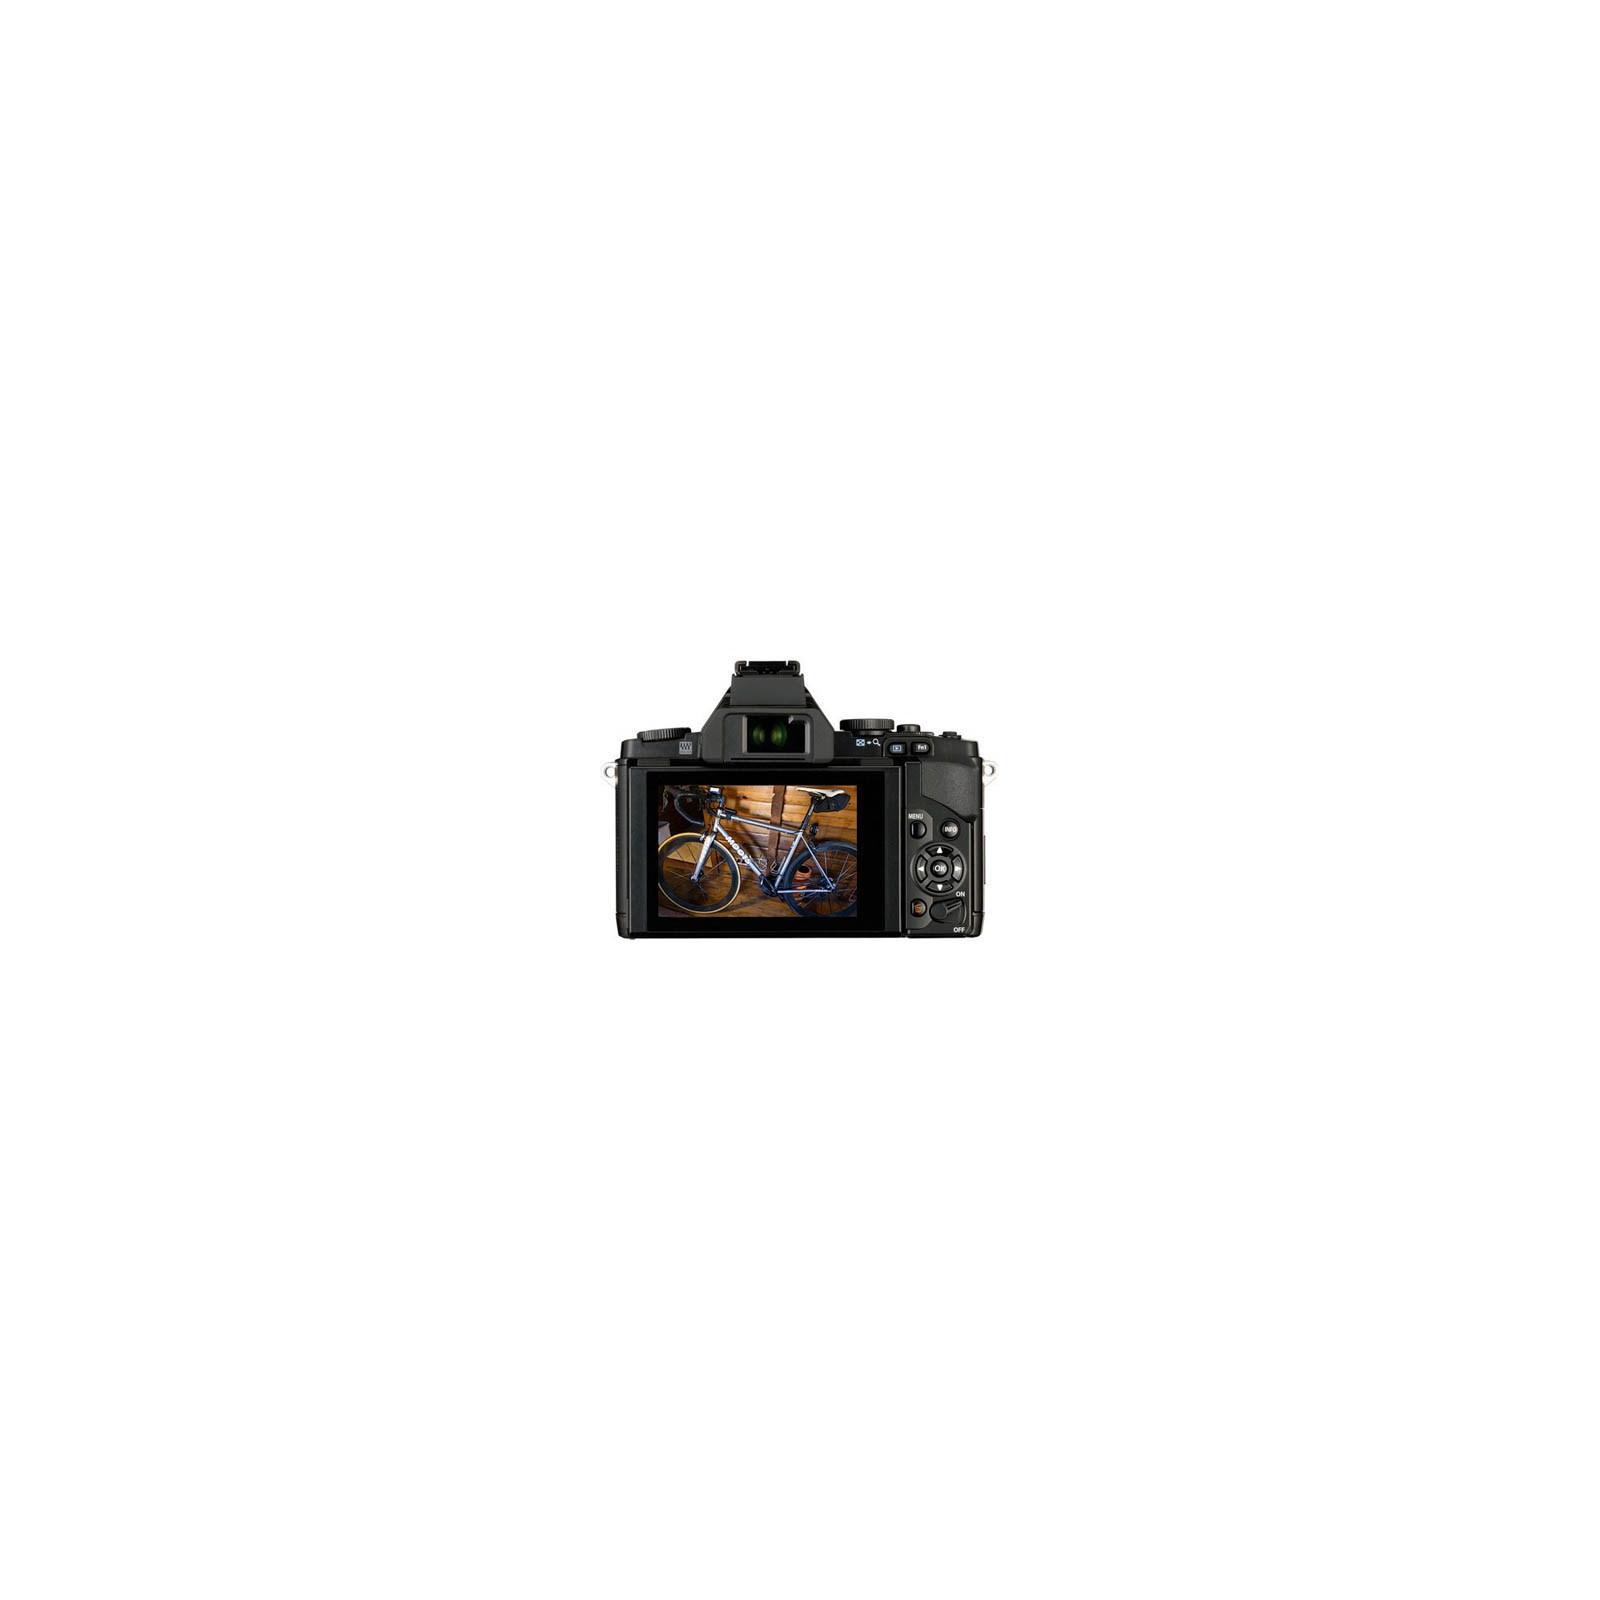 Цифровой фотоаппарат OLYMPUS OM-D E-M5 body black (V204040BE000) изображение 2